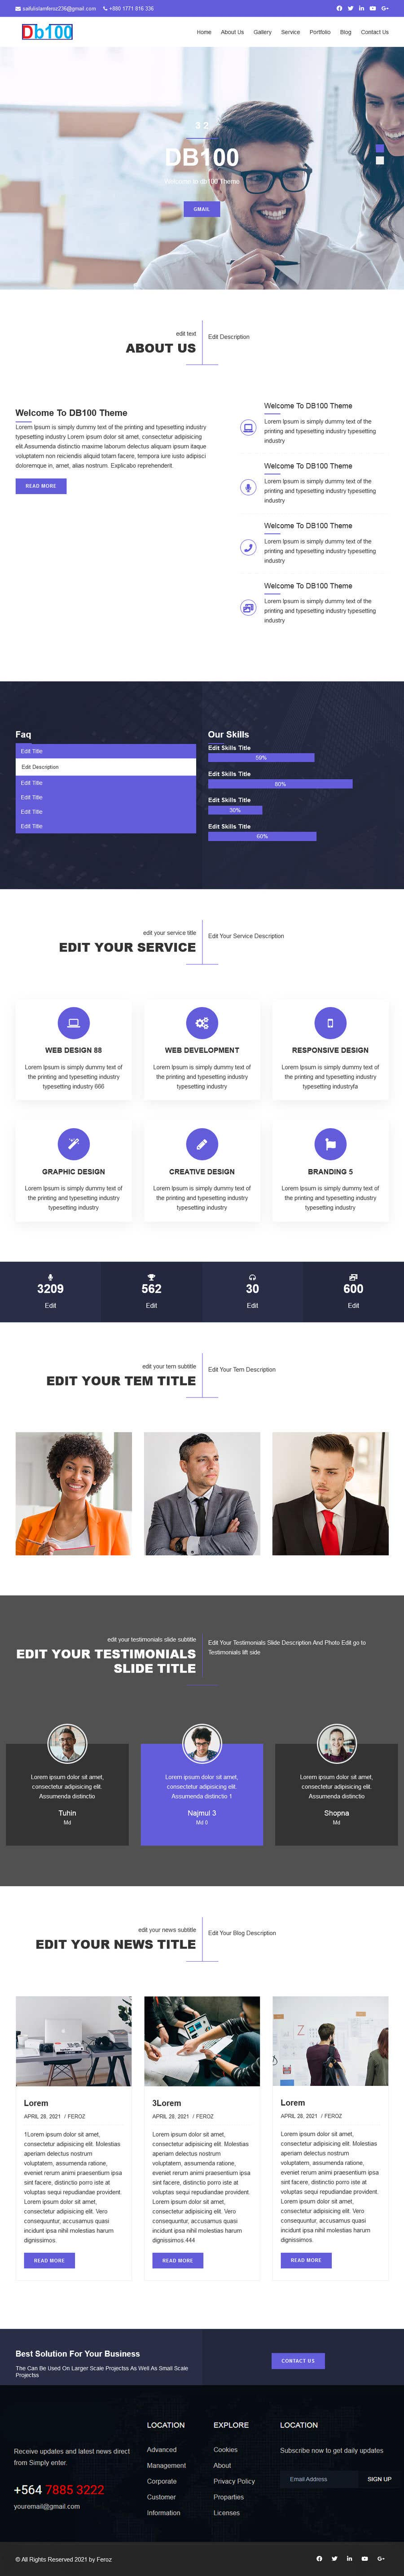 Bài tham dự cuộc thi #                                        16                                      cho                                         Create a single page design for an existing site